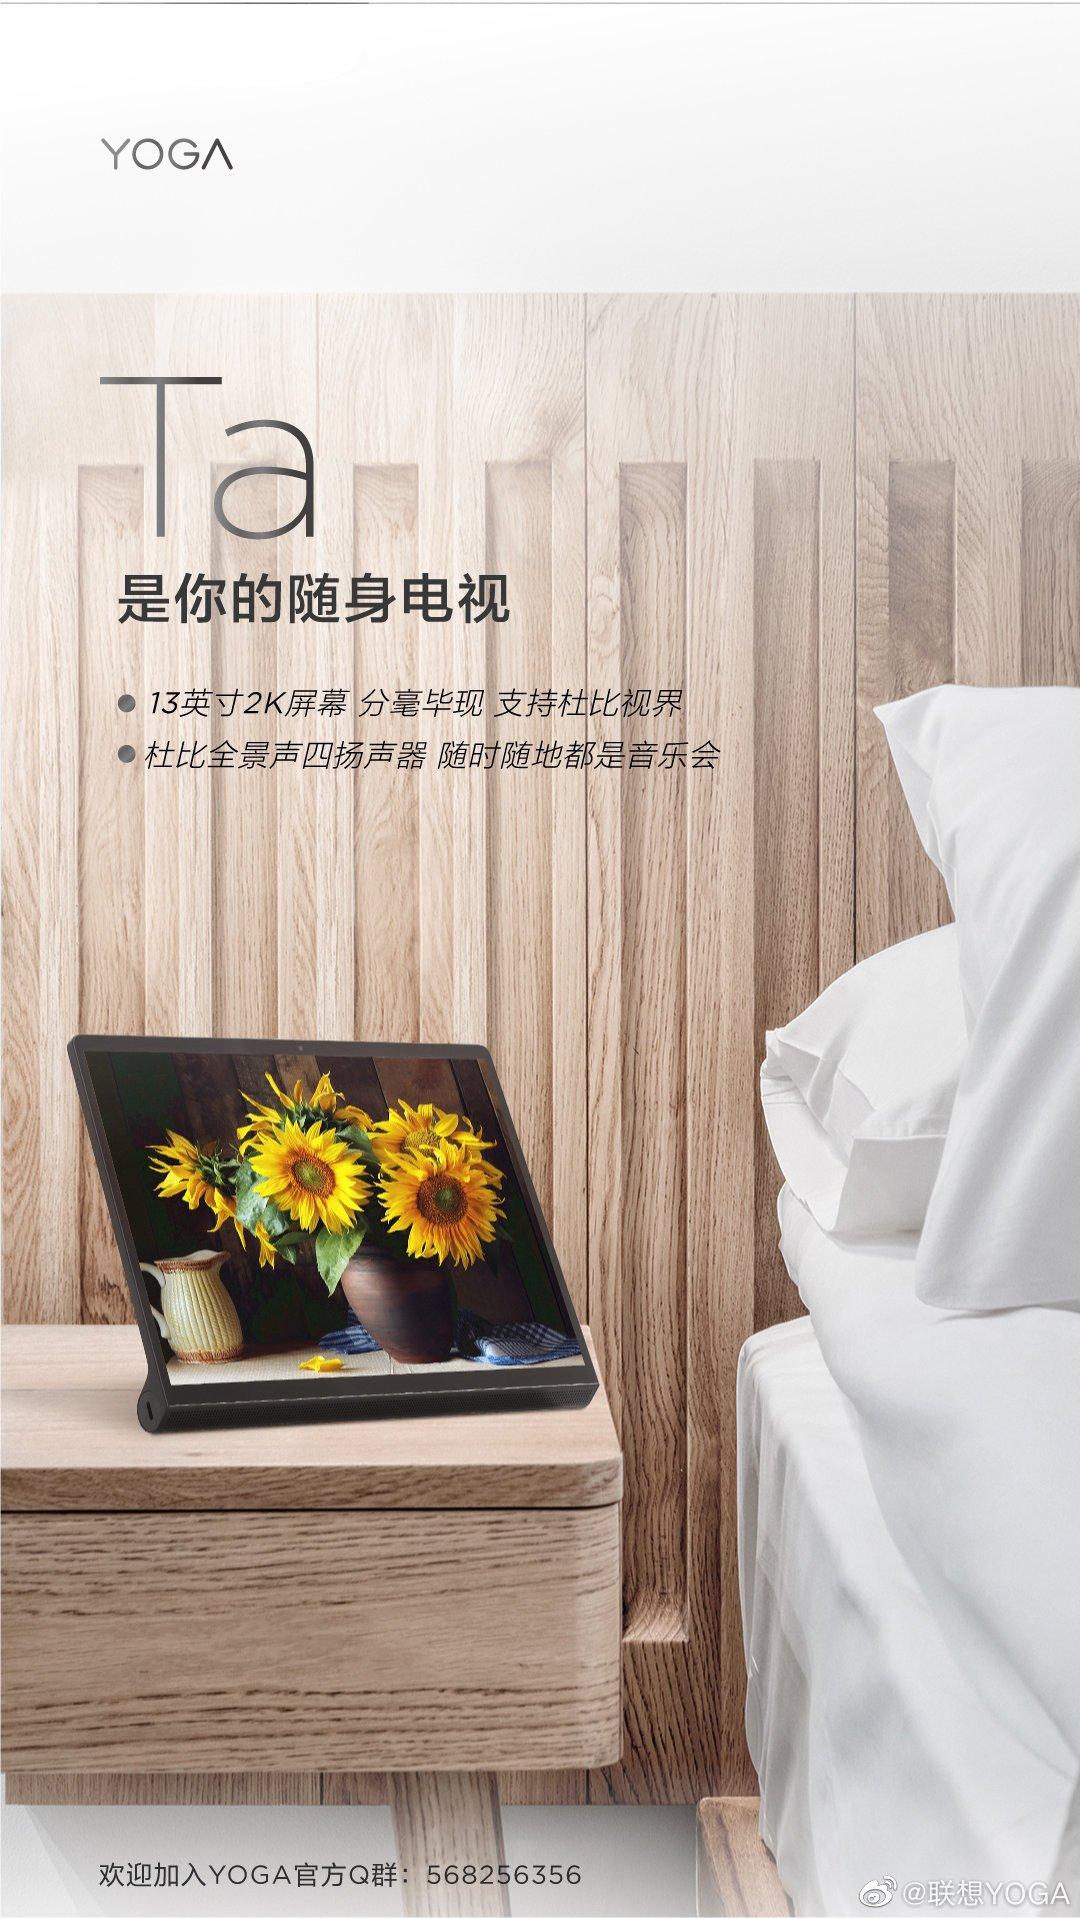 Lenovo YOGA Pad Pro Display